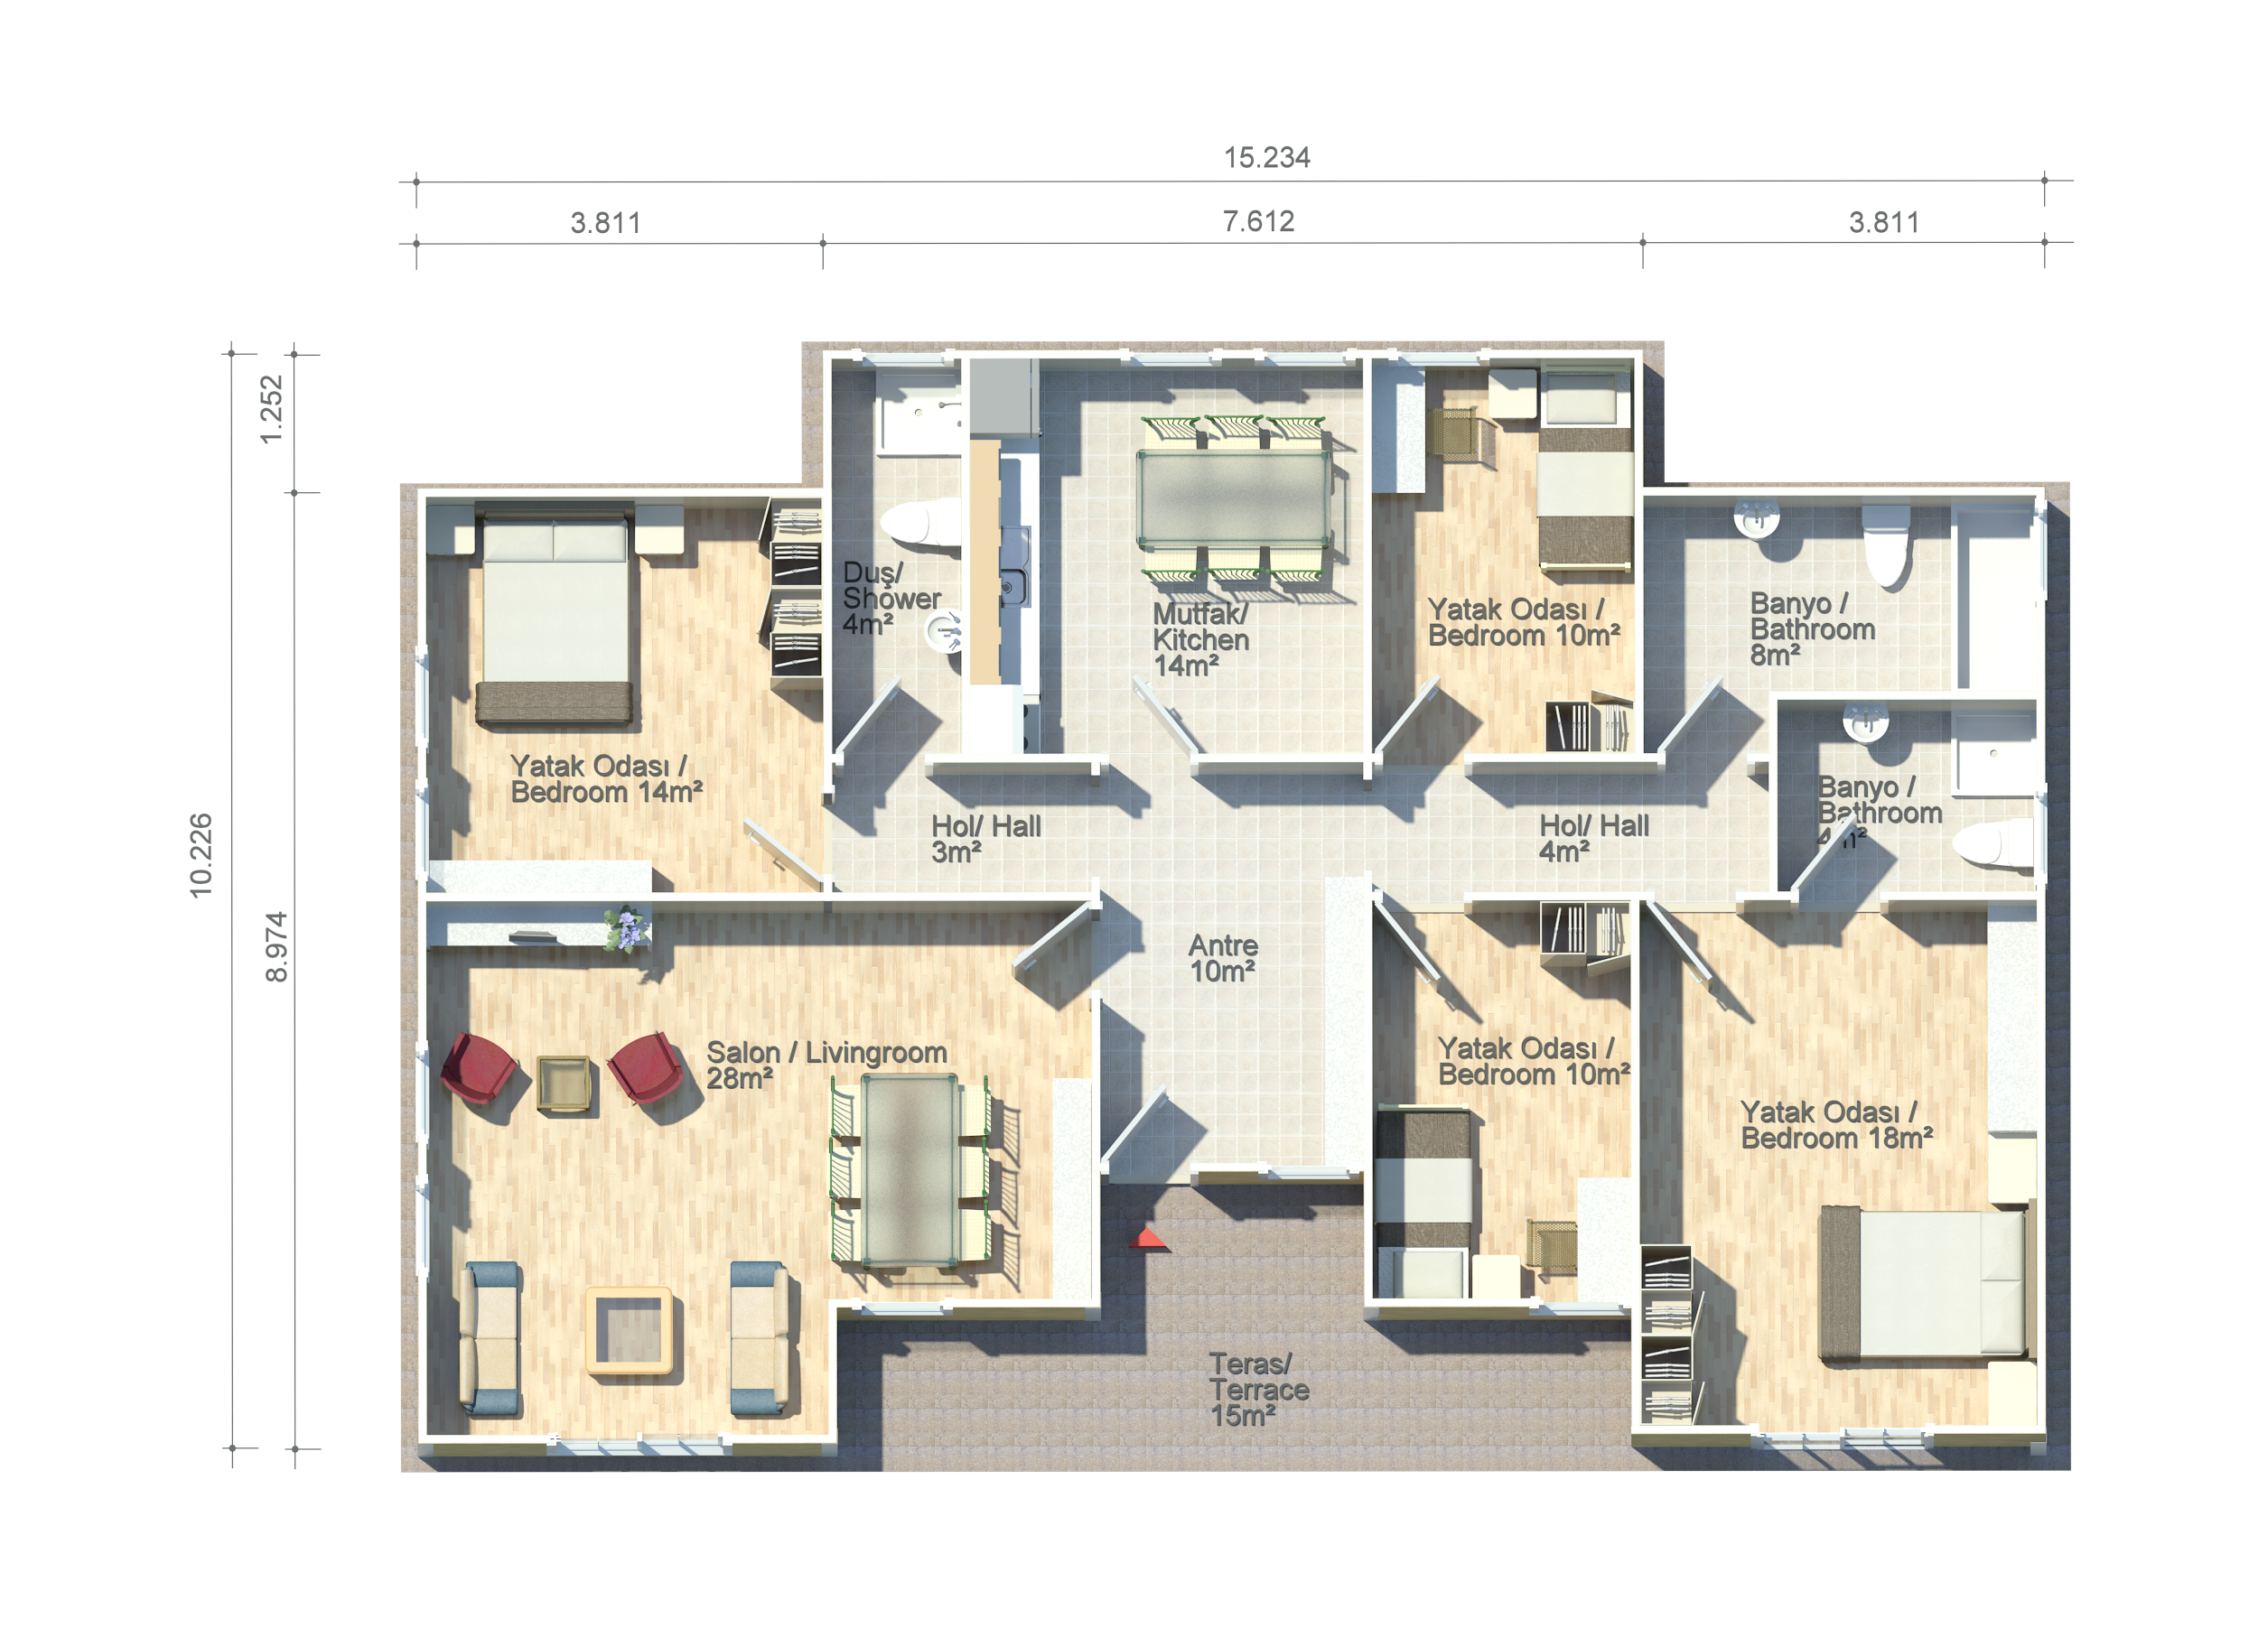 sardunya 134 m2 floor plan kit homes pinterest